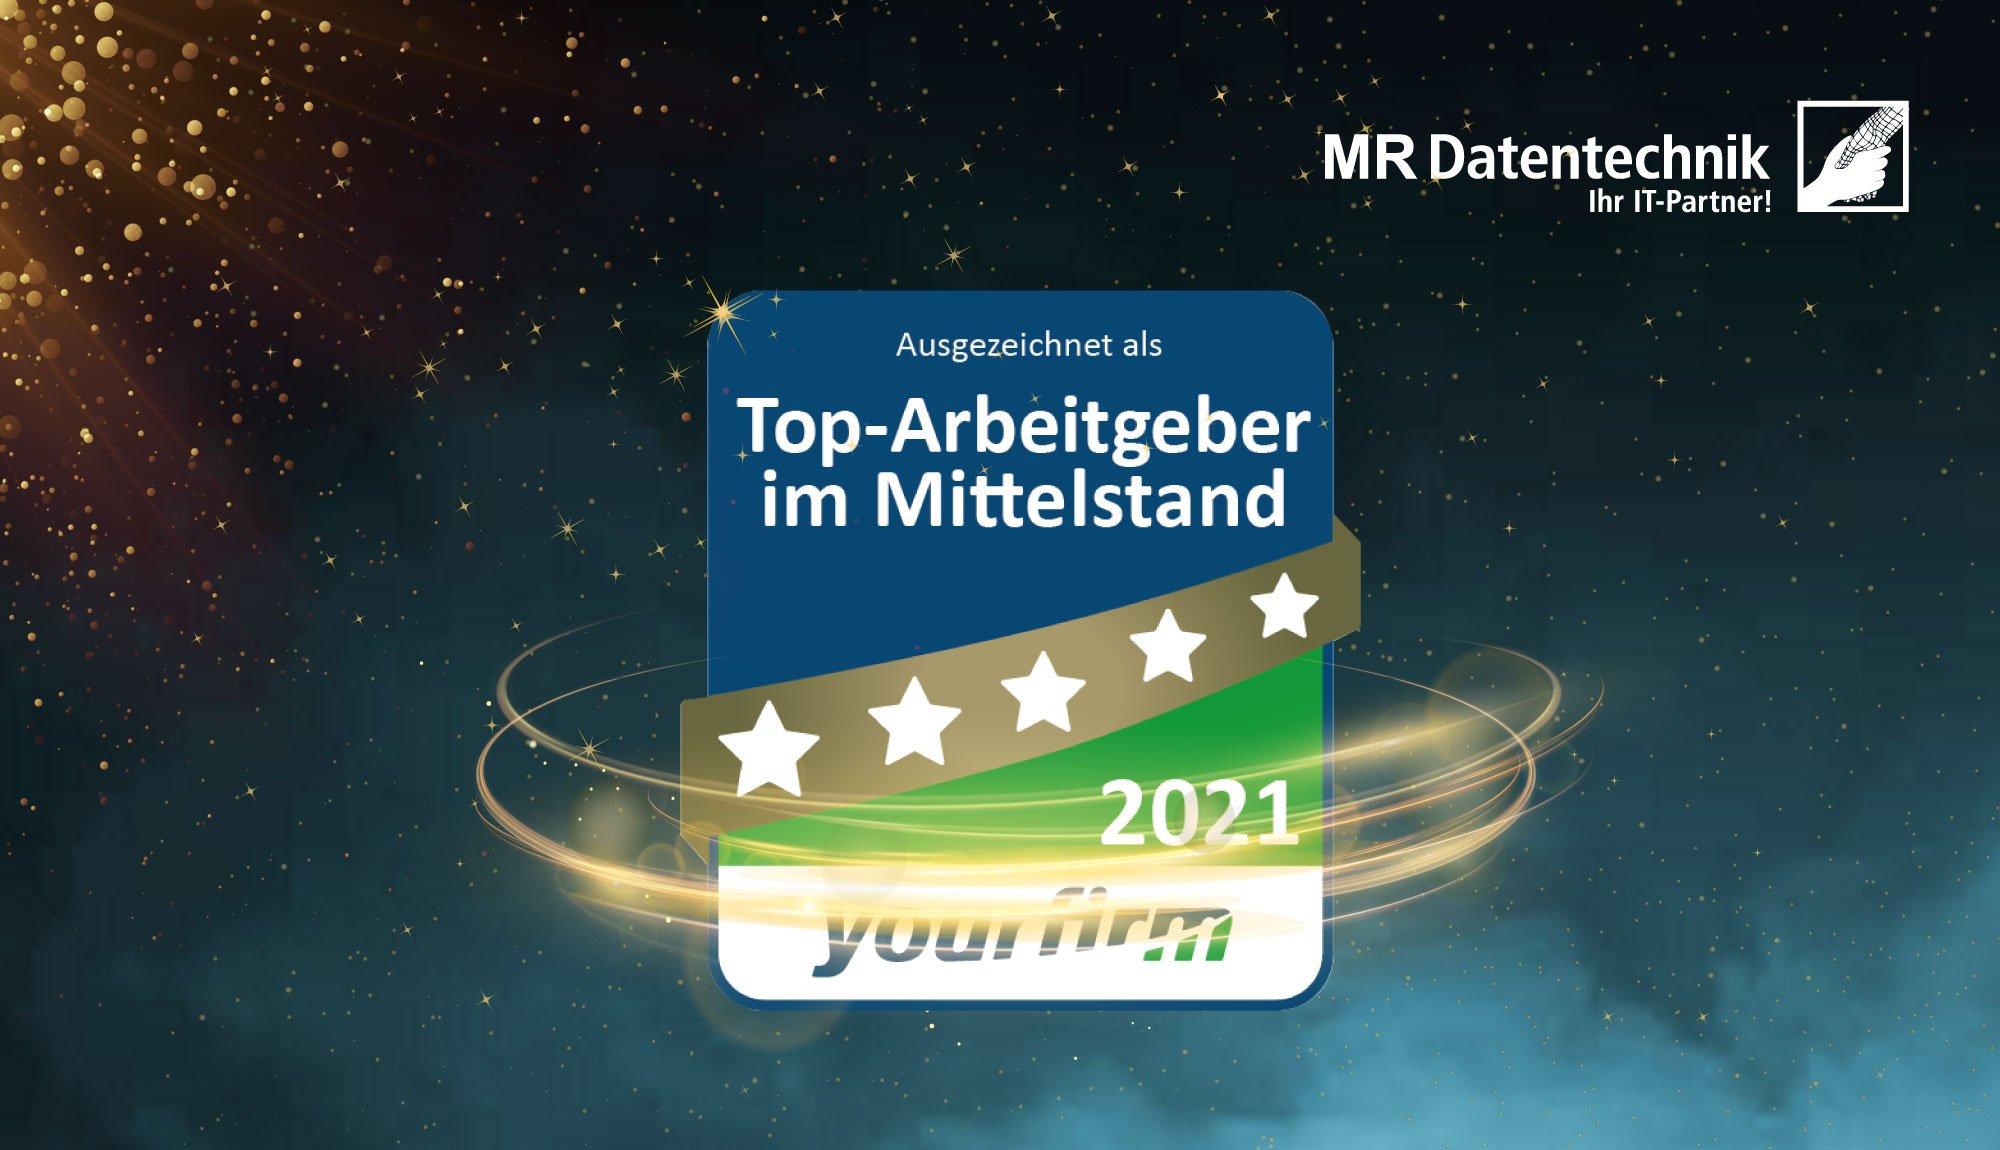 MR Datentechnik ist Top-Arbeitgeber 2021 Siegel